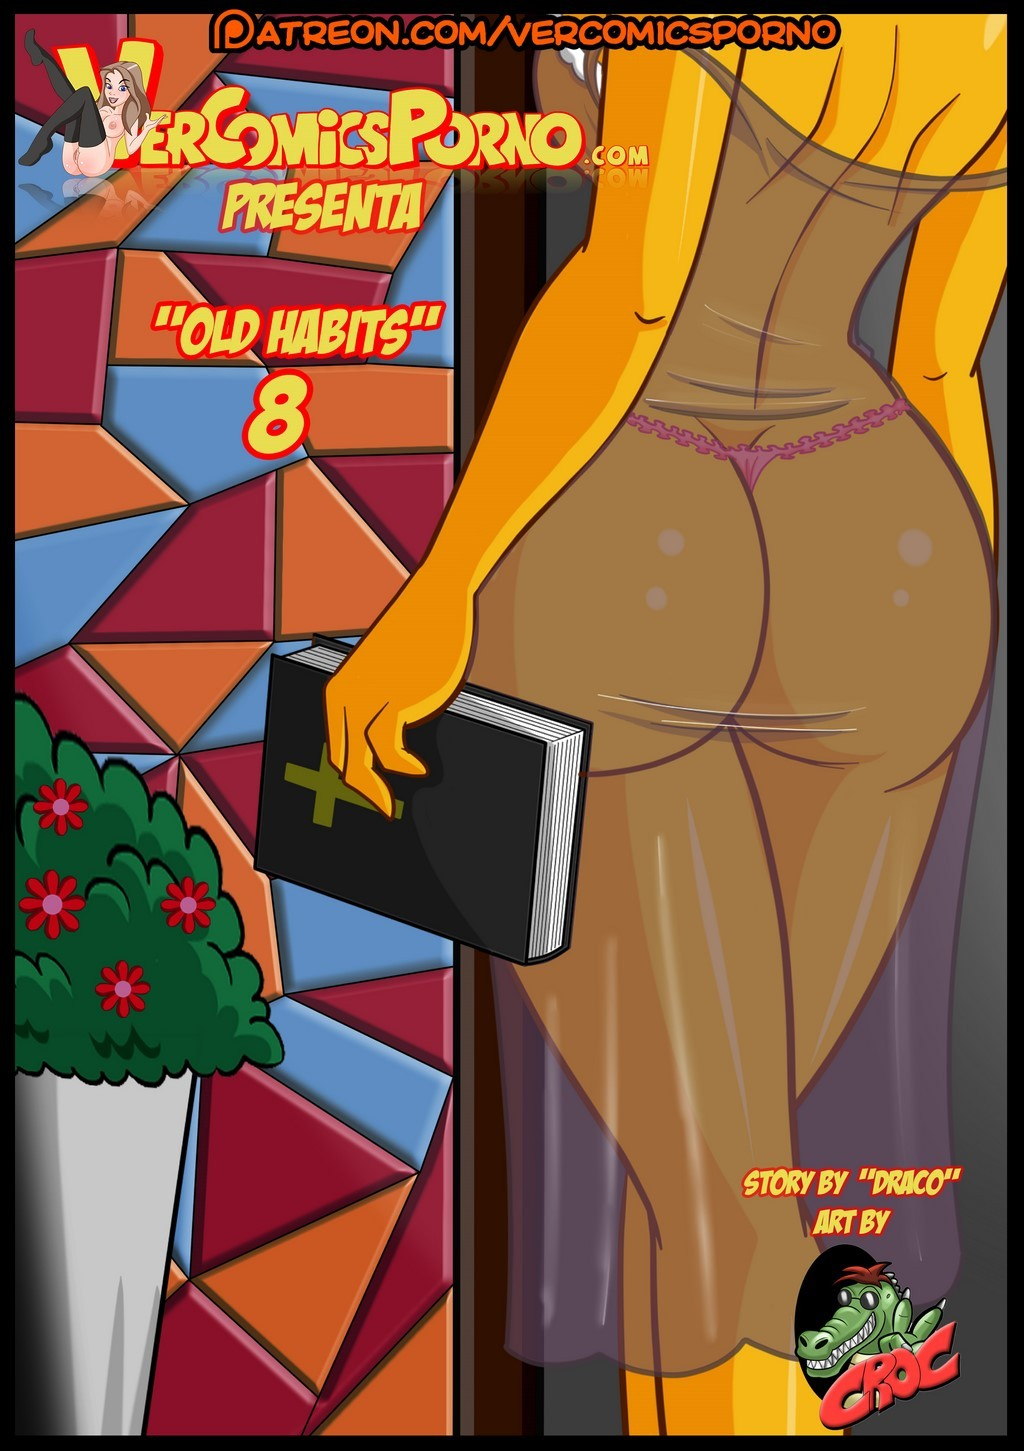 Goodcomix.tk The Simpsons - [VerComicsPorno][Croc] - Los Simpsons Viejas Costumbres.8 - Old Habits 8